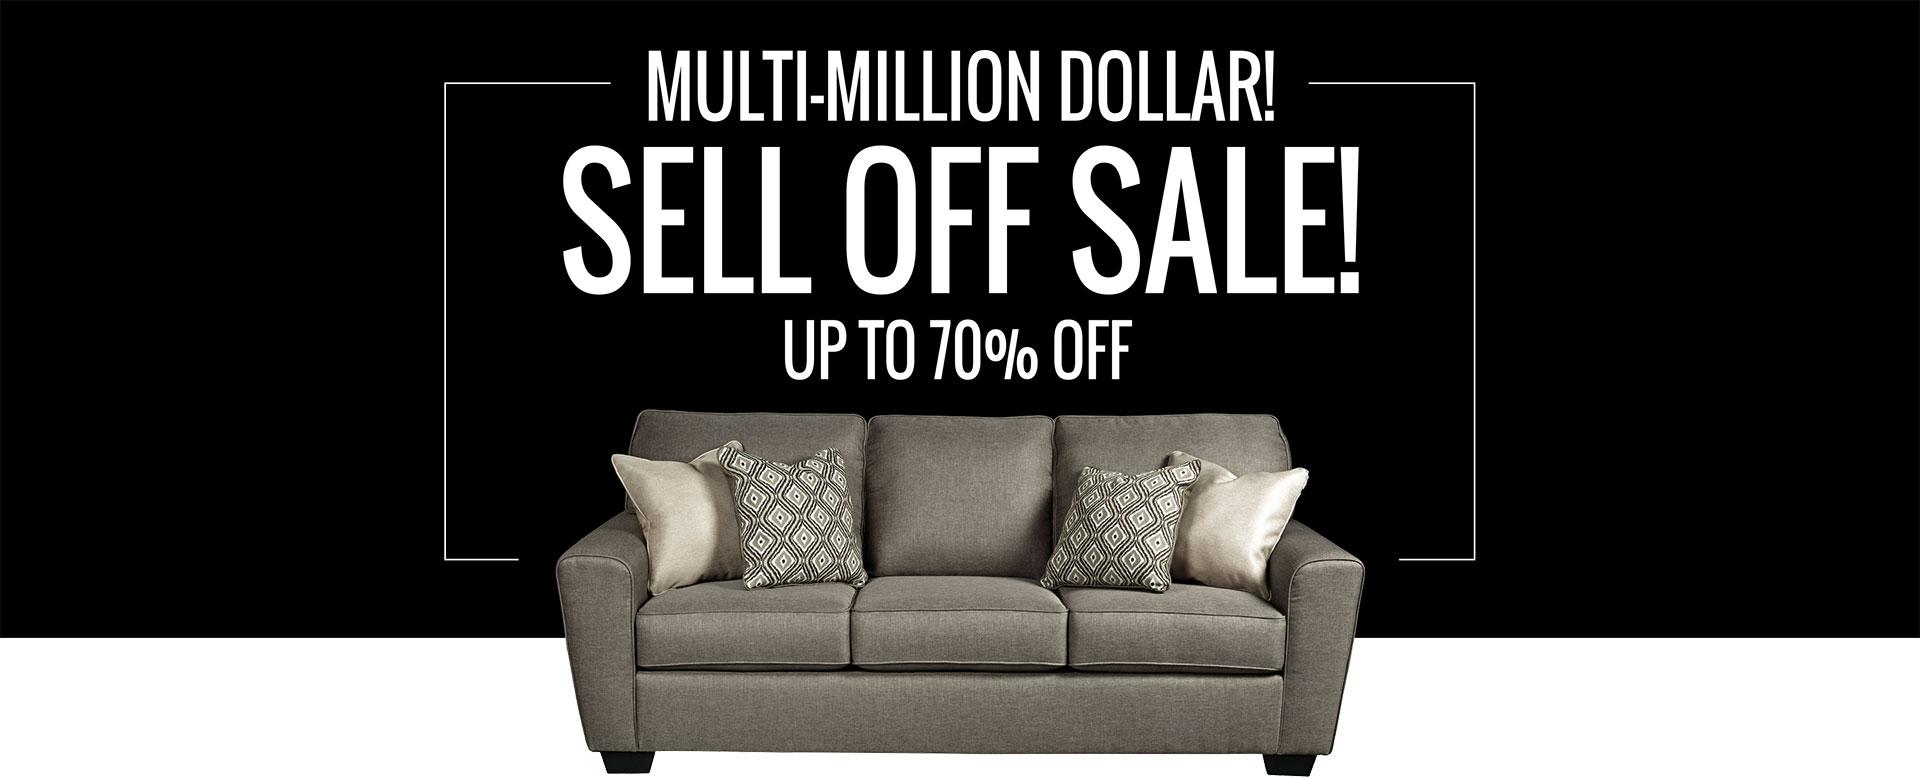 Multi Million Dollar Sell Off Sale!